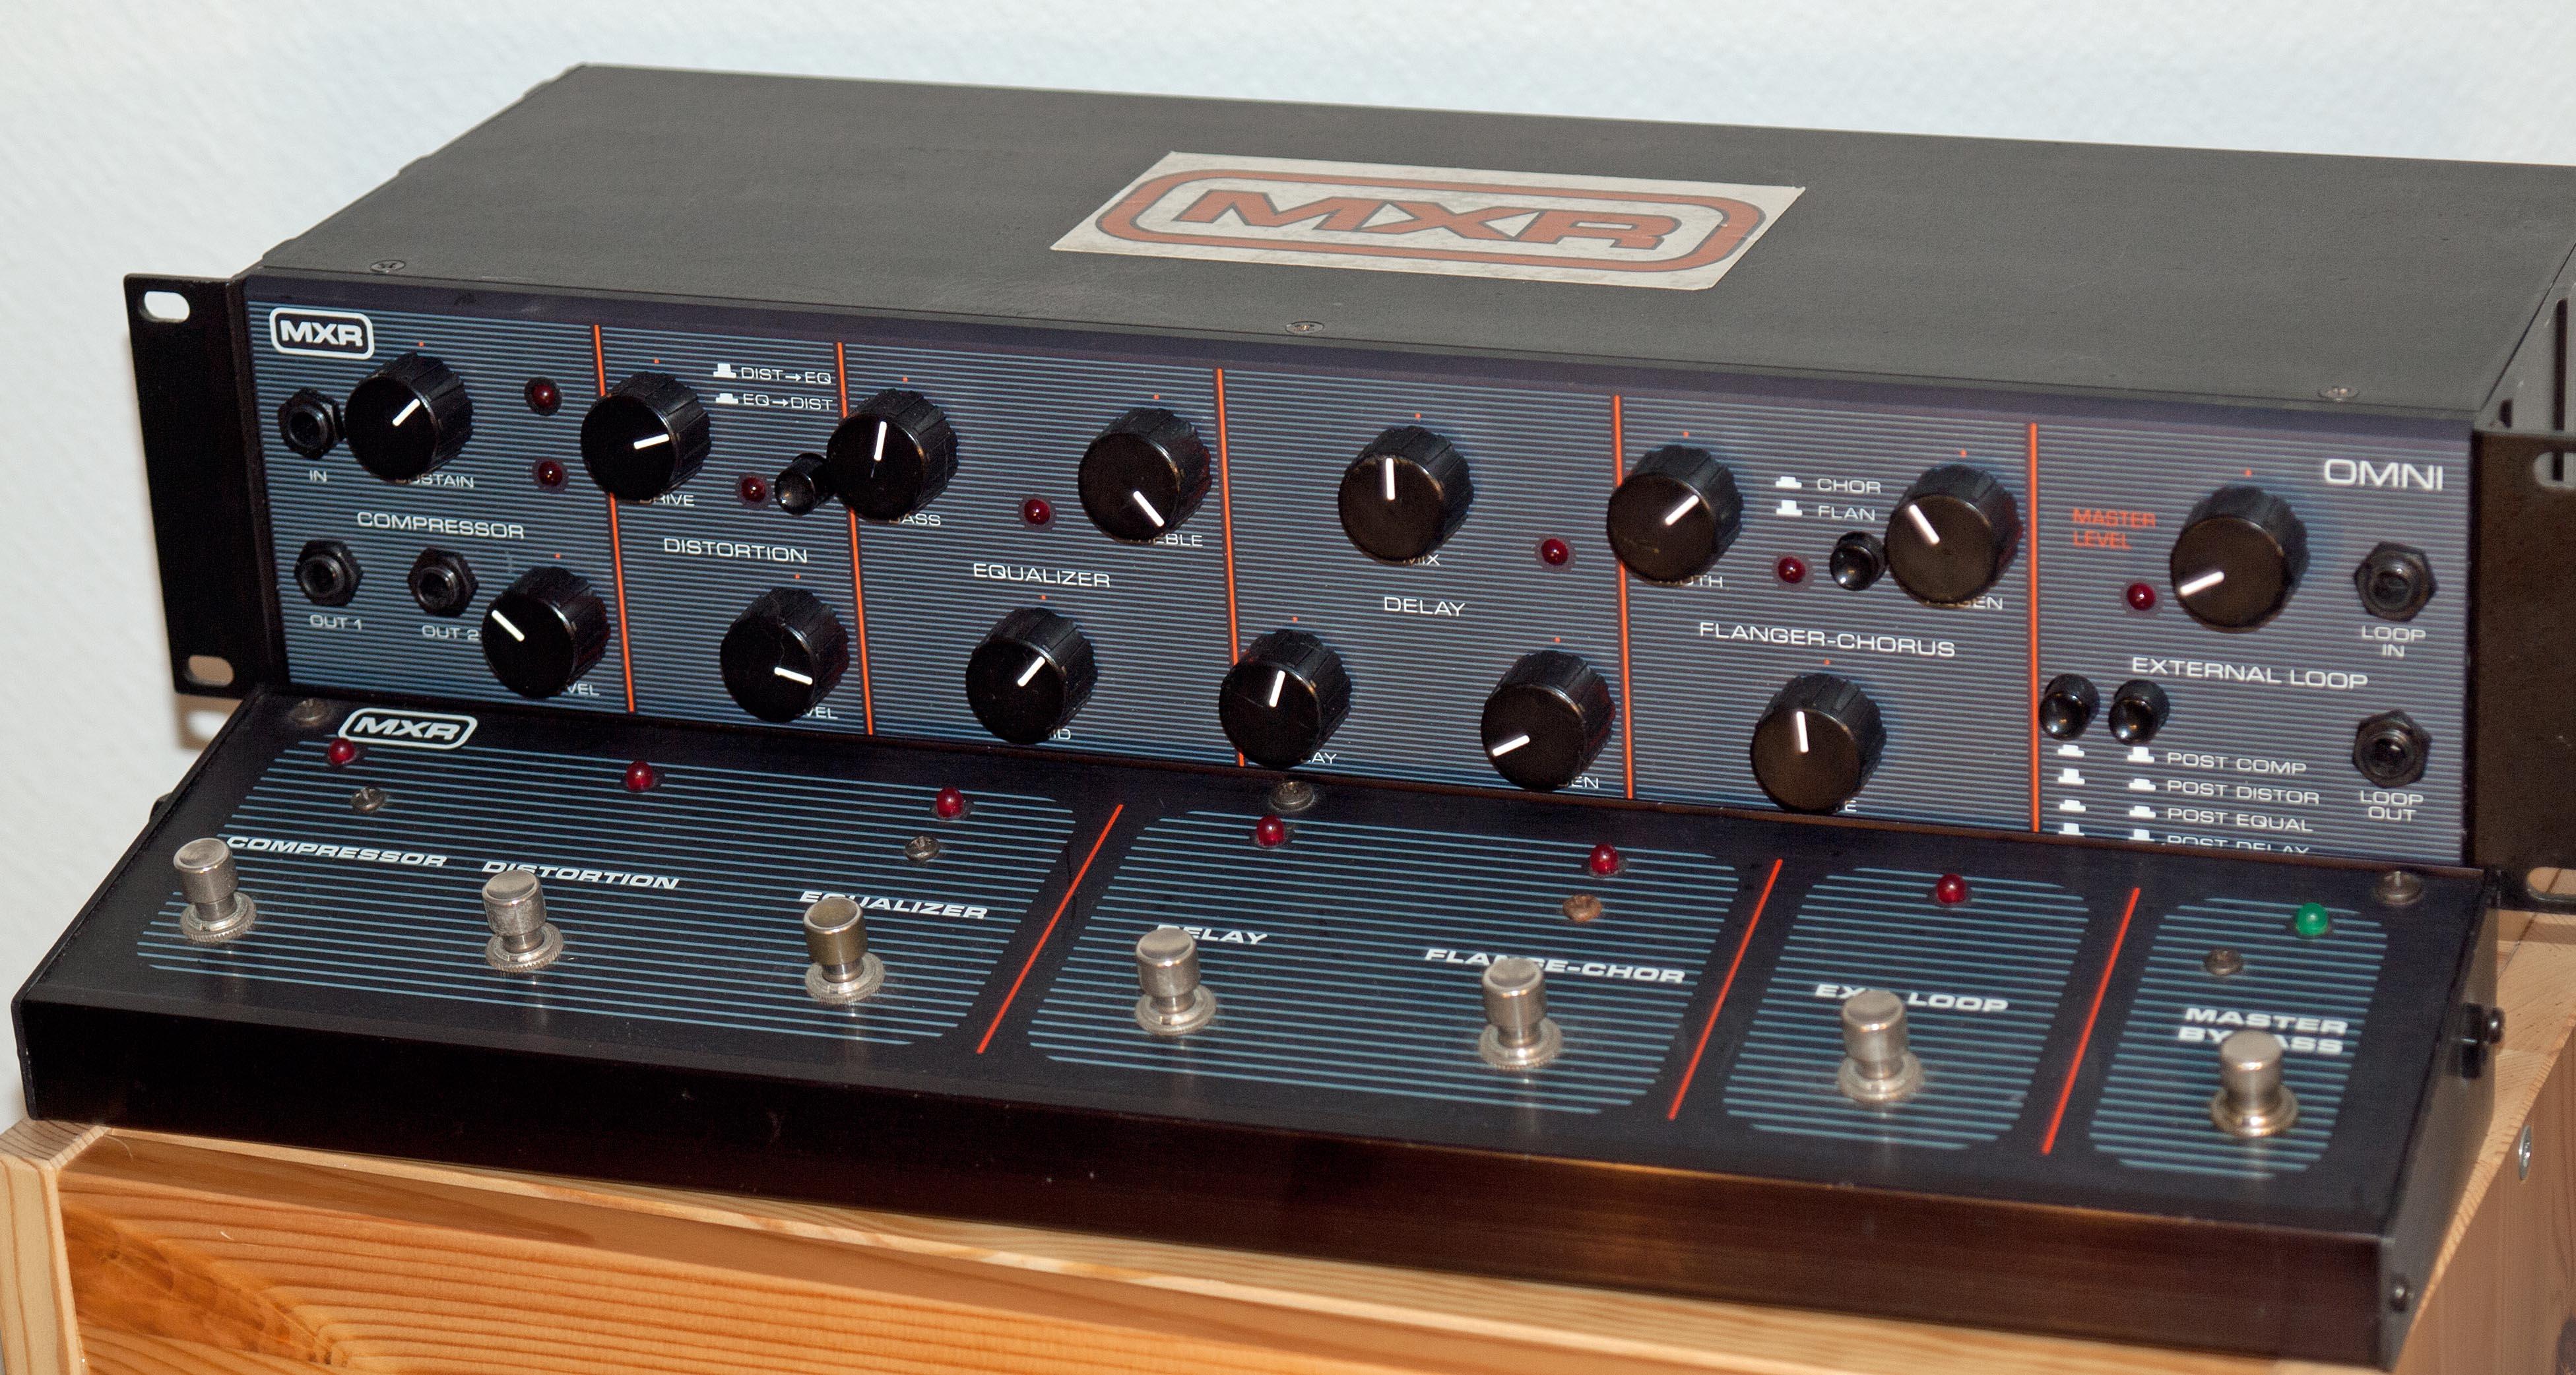 MXR M288 Bass Octave Deluxe Effects Pedal Blue Sparkle ...